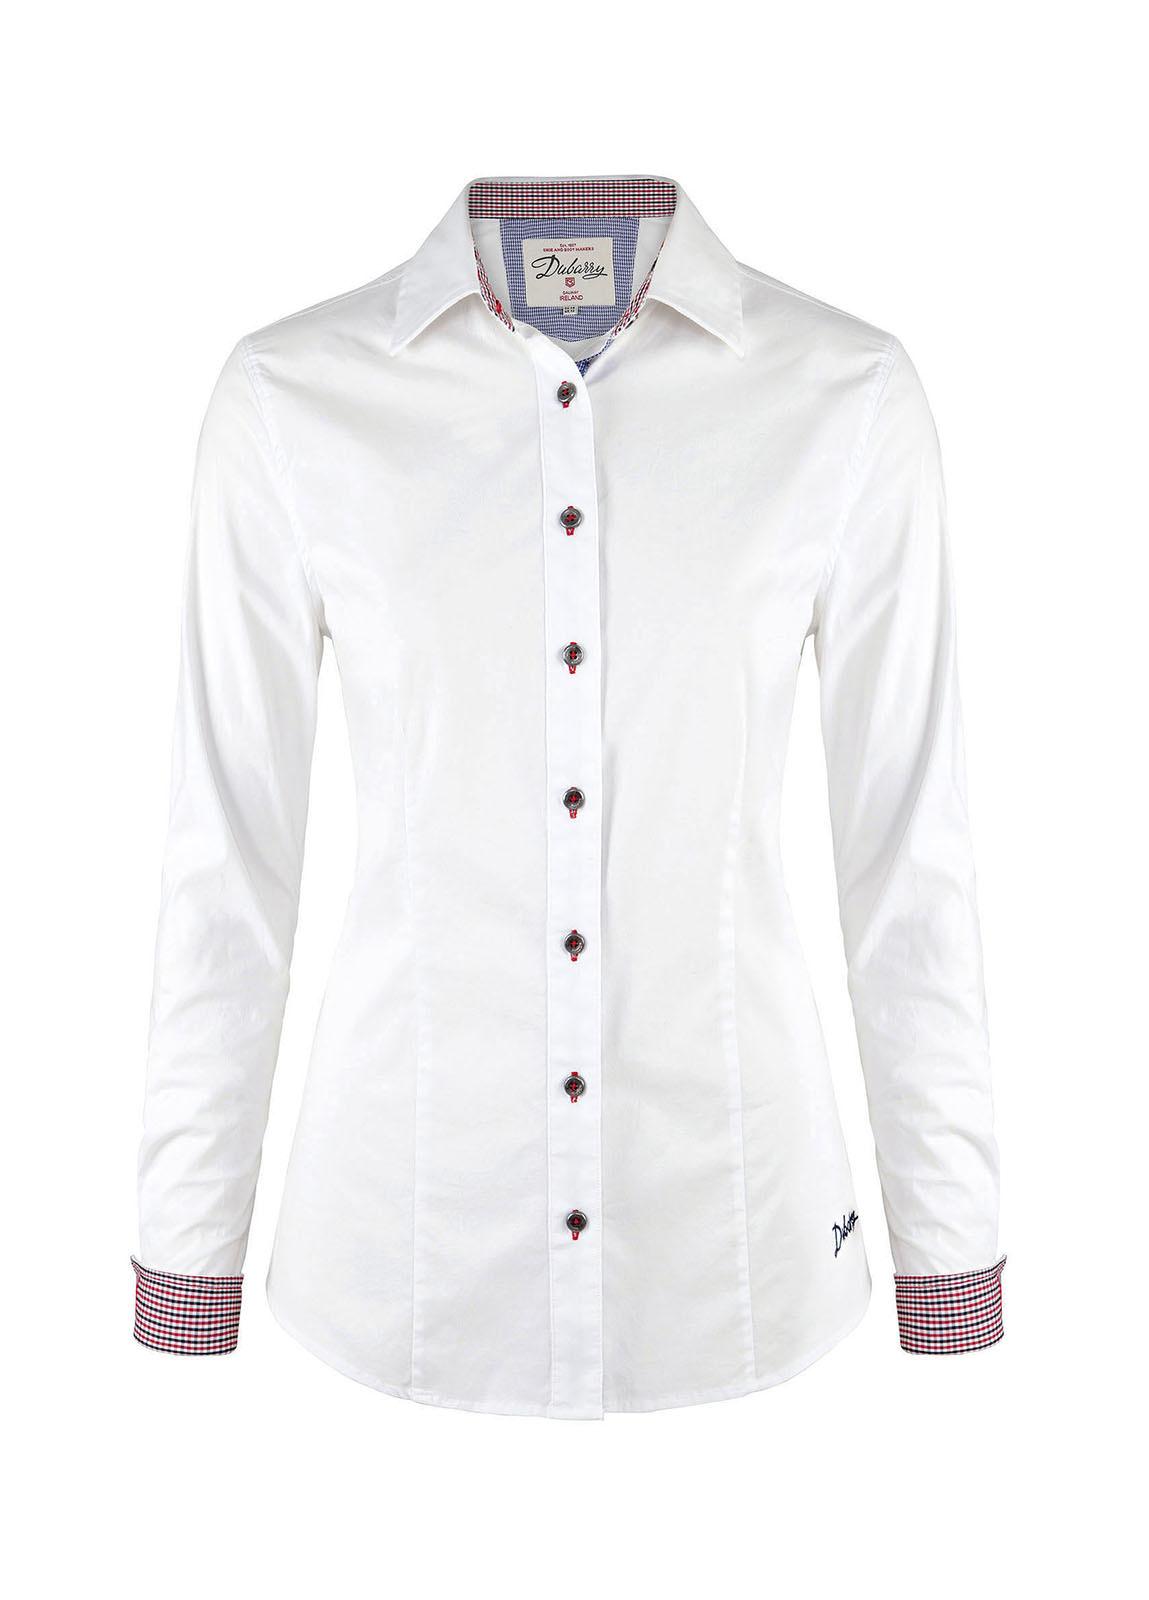 Carnation Womens Shirt - White